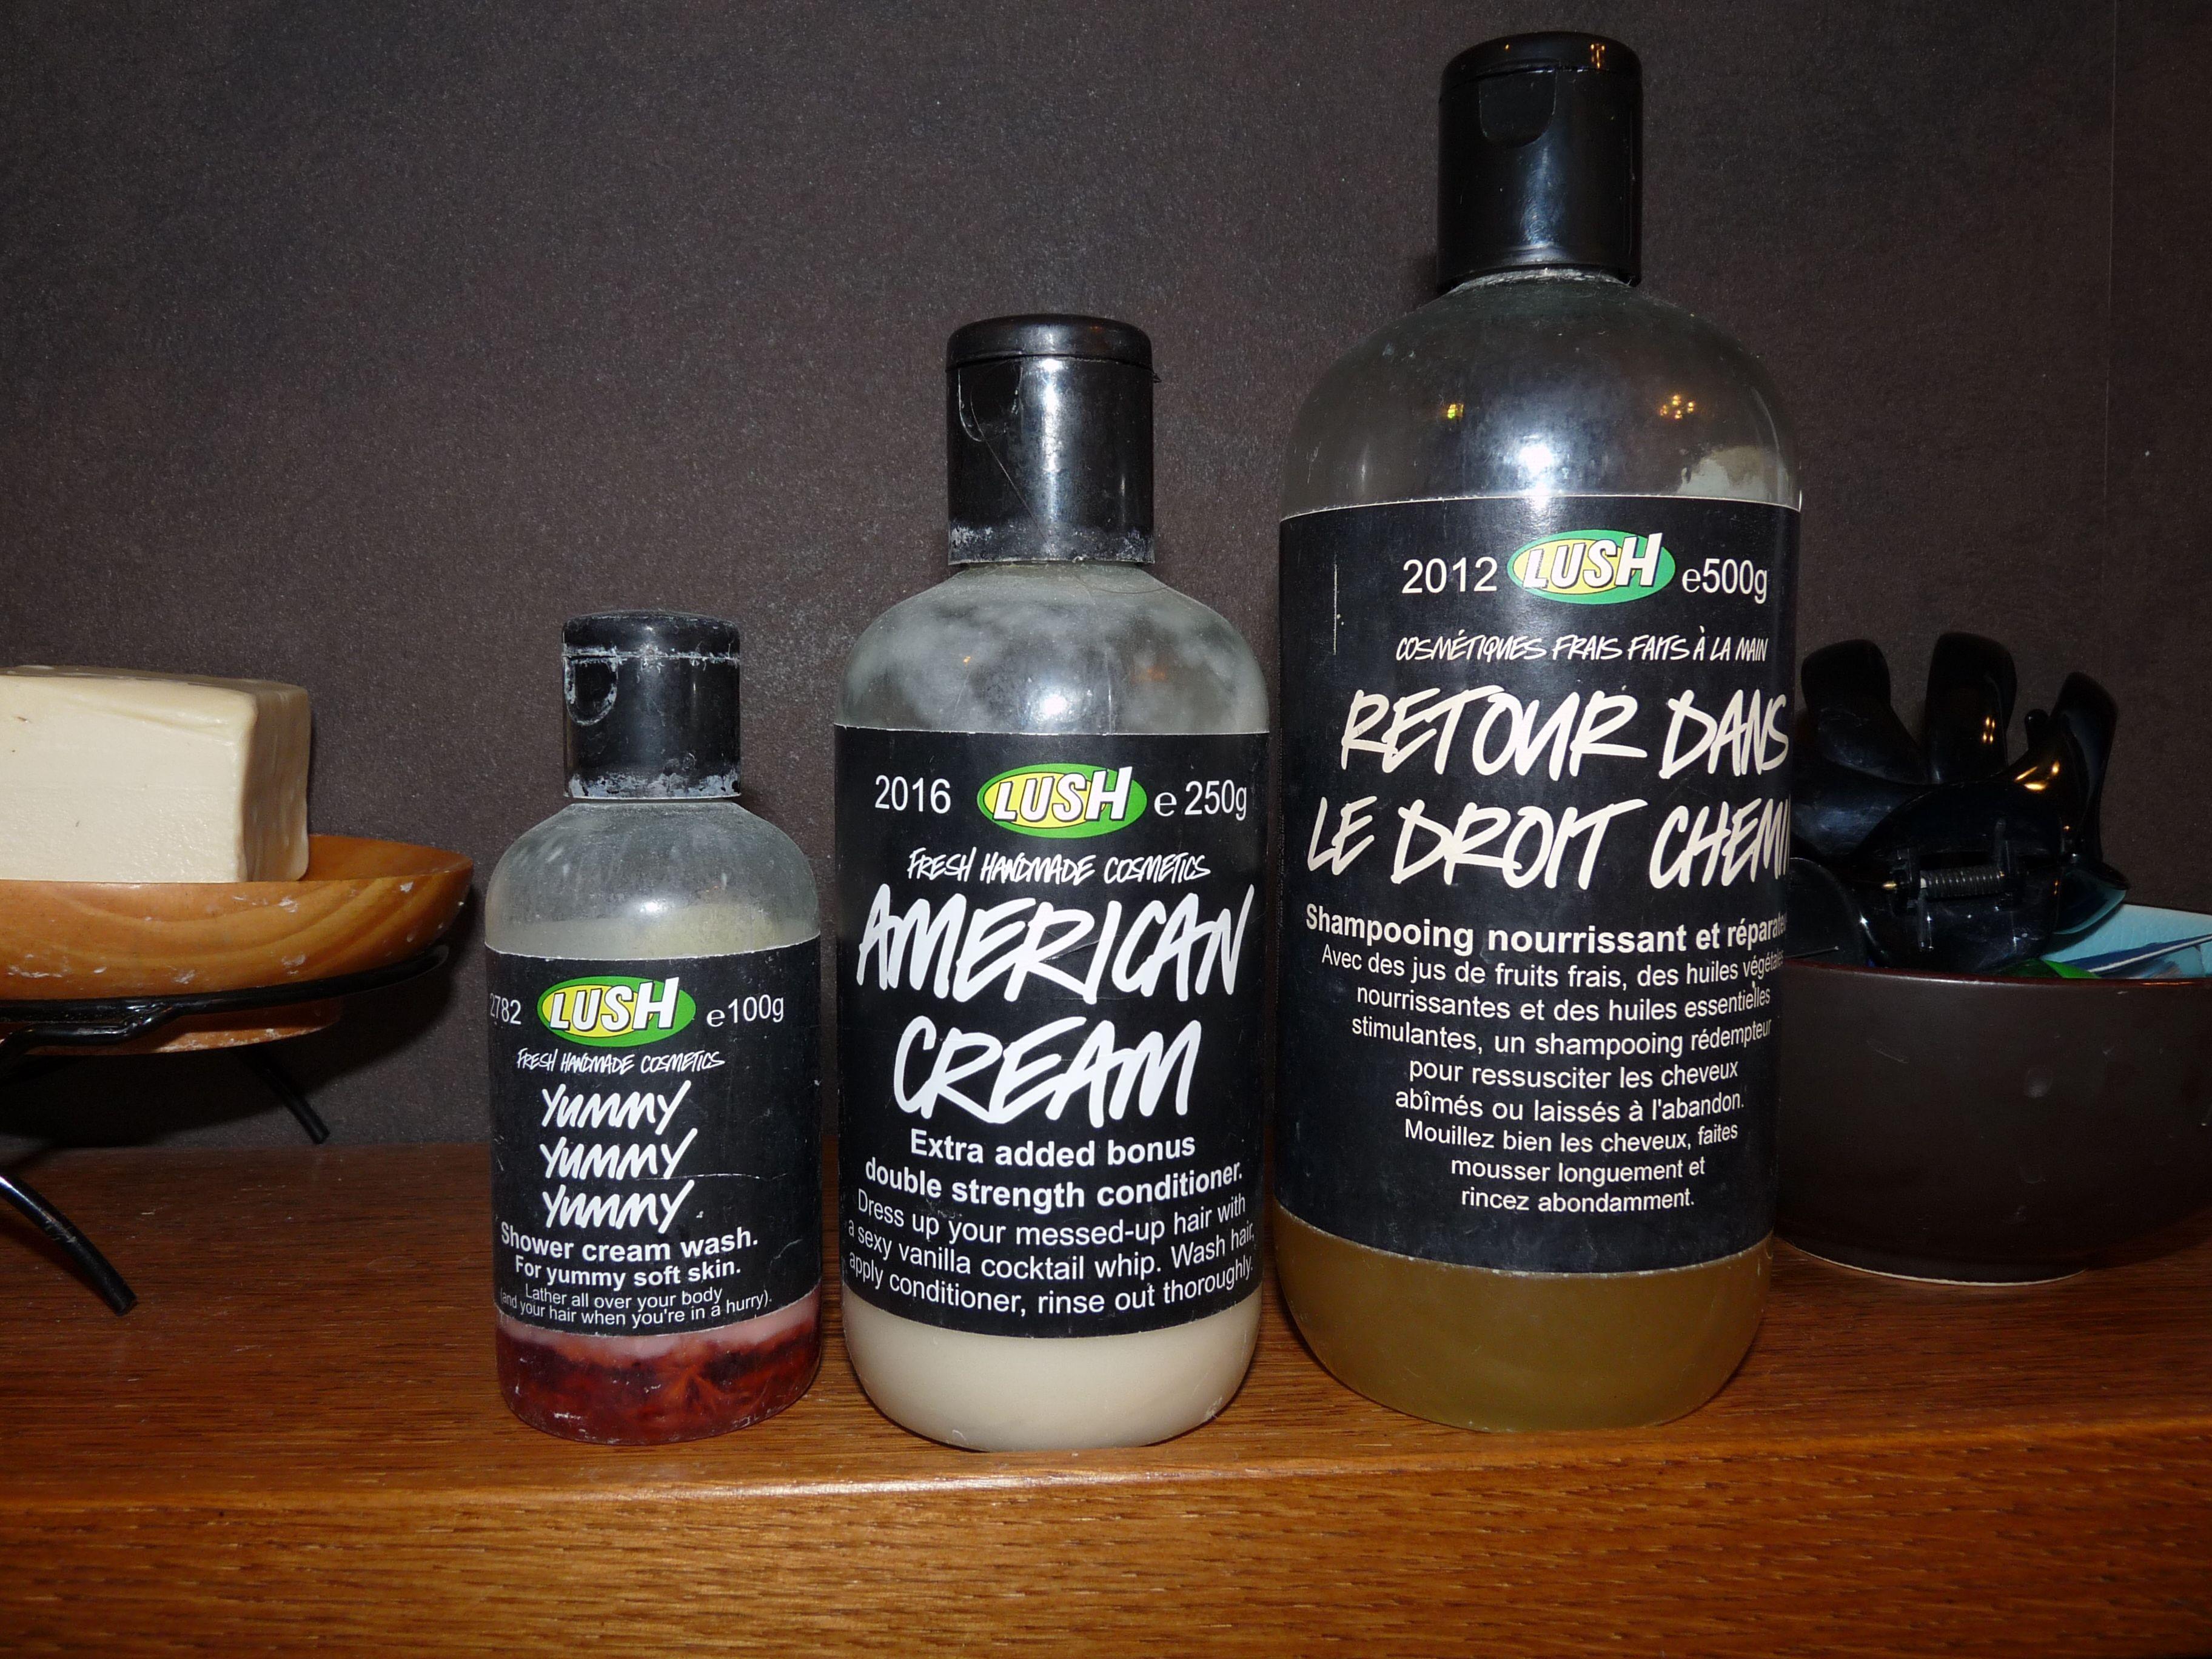 Lush shampooing liquide cheveux American cream